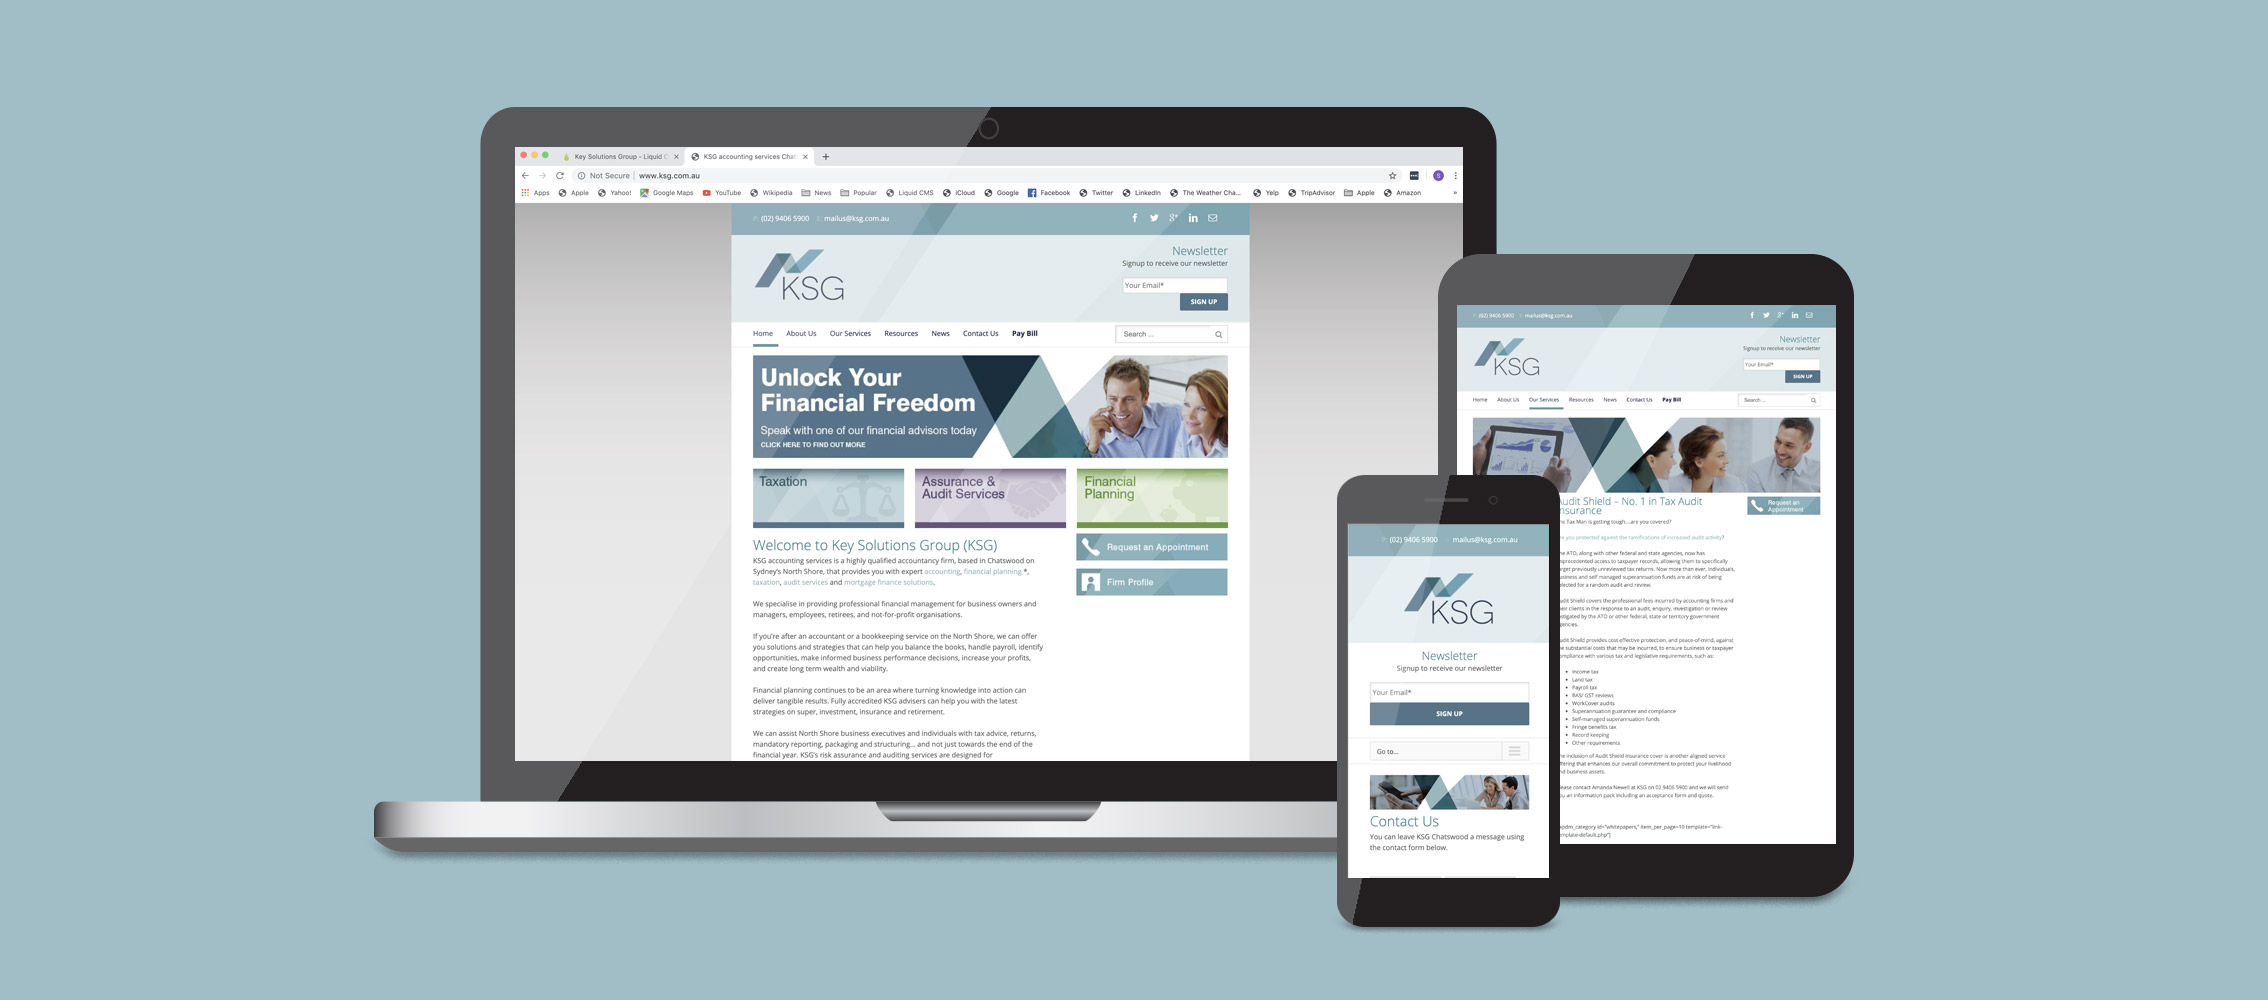 Key Solutions Group Website Design